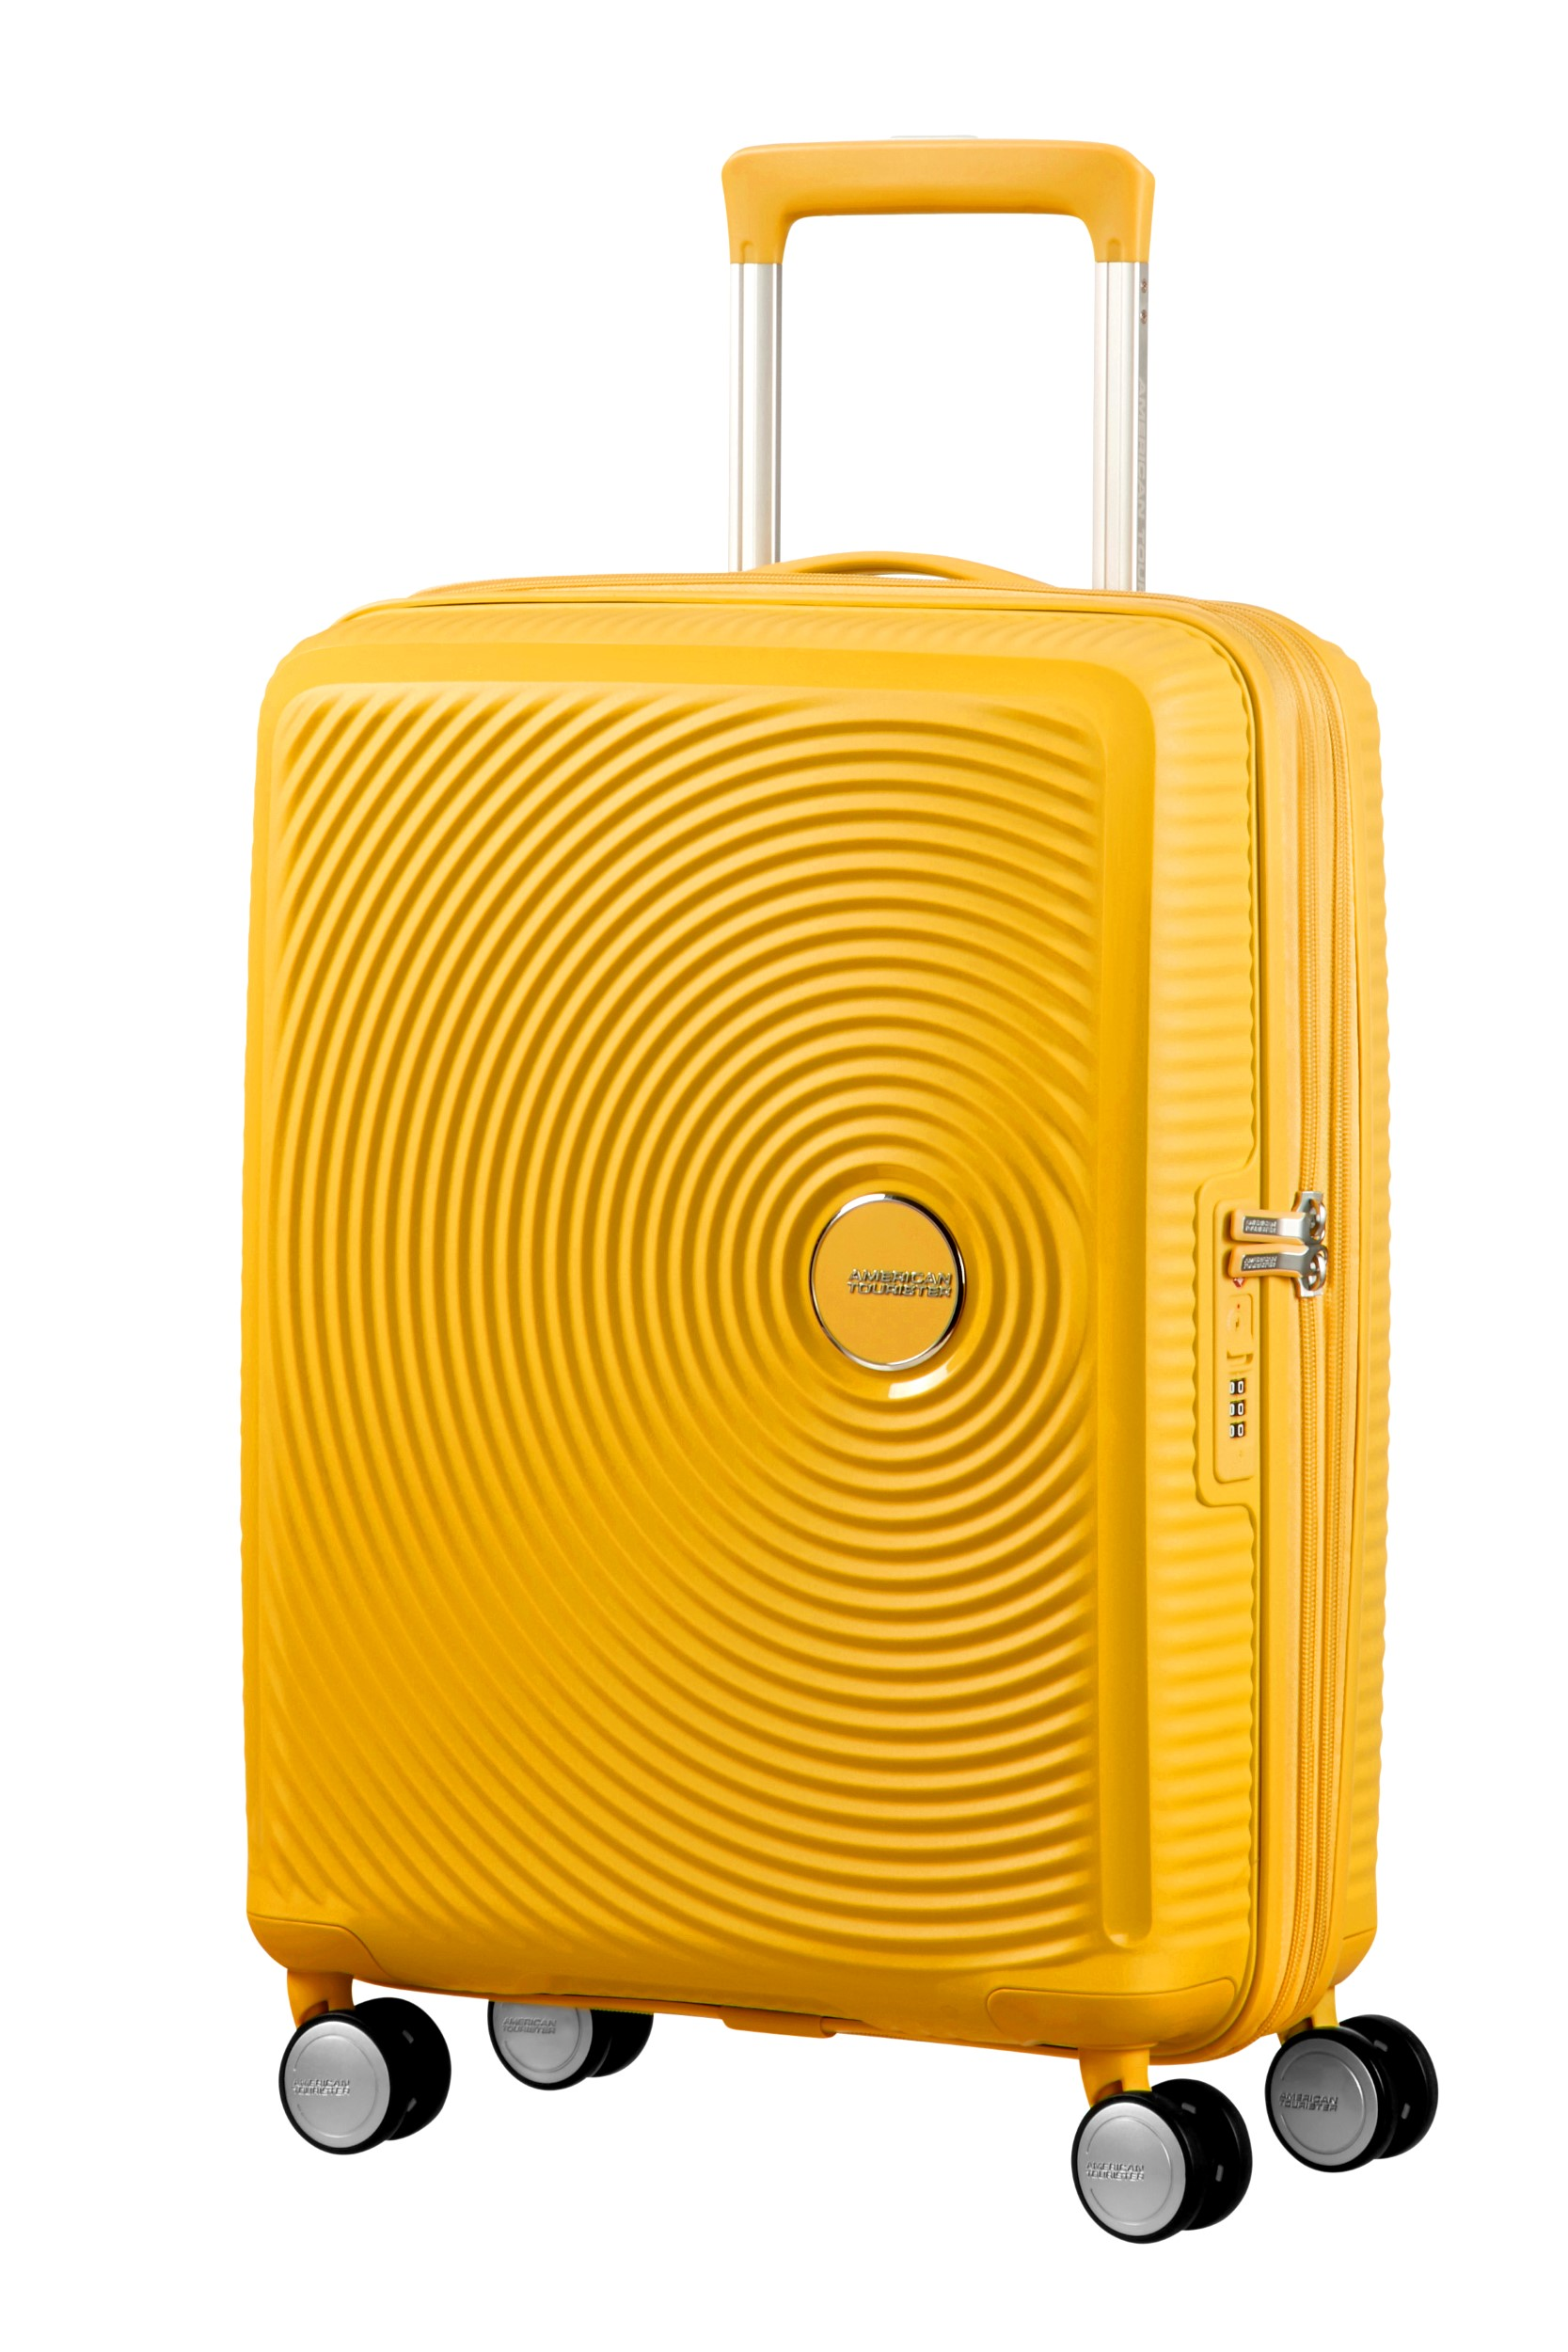 SOUNDBOX מזוודה עליה למטוס אמריקן טוריסטר מבית סמסונייט מחיר 595 שח צילום יחצ (1)